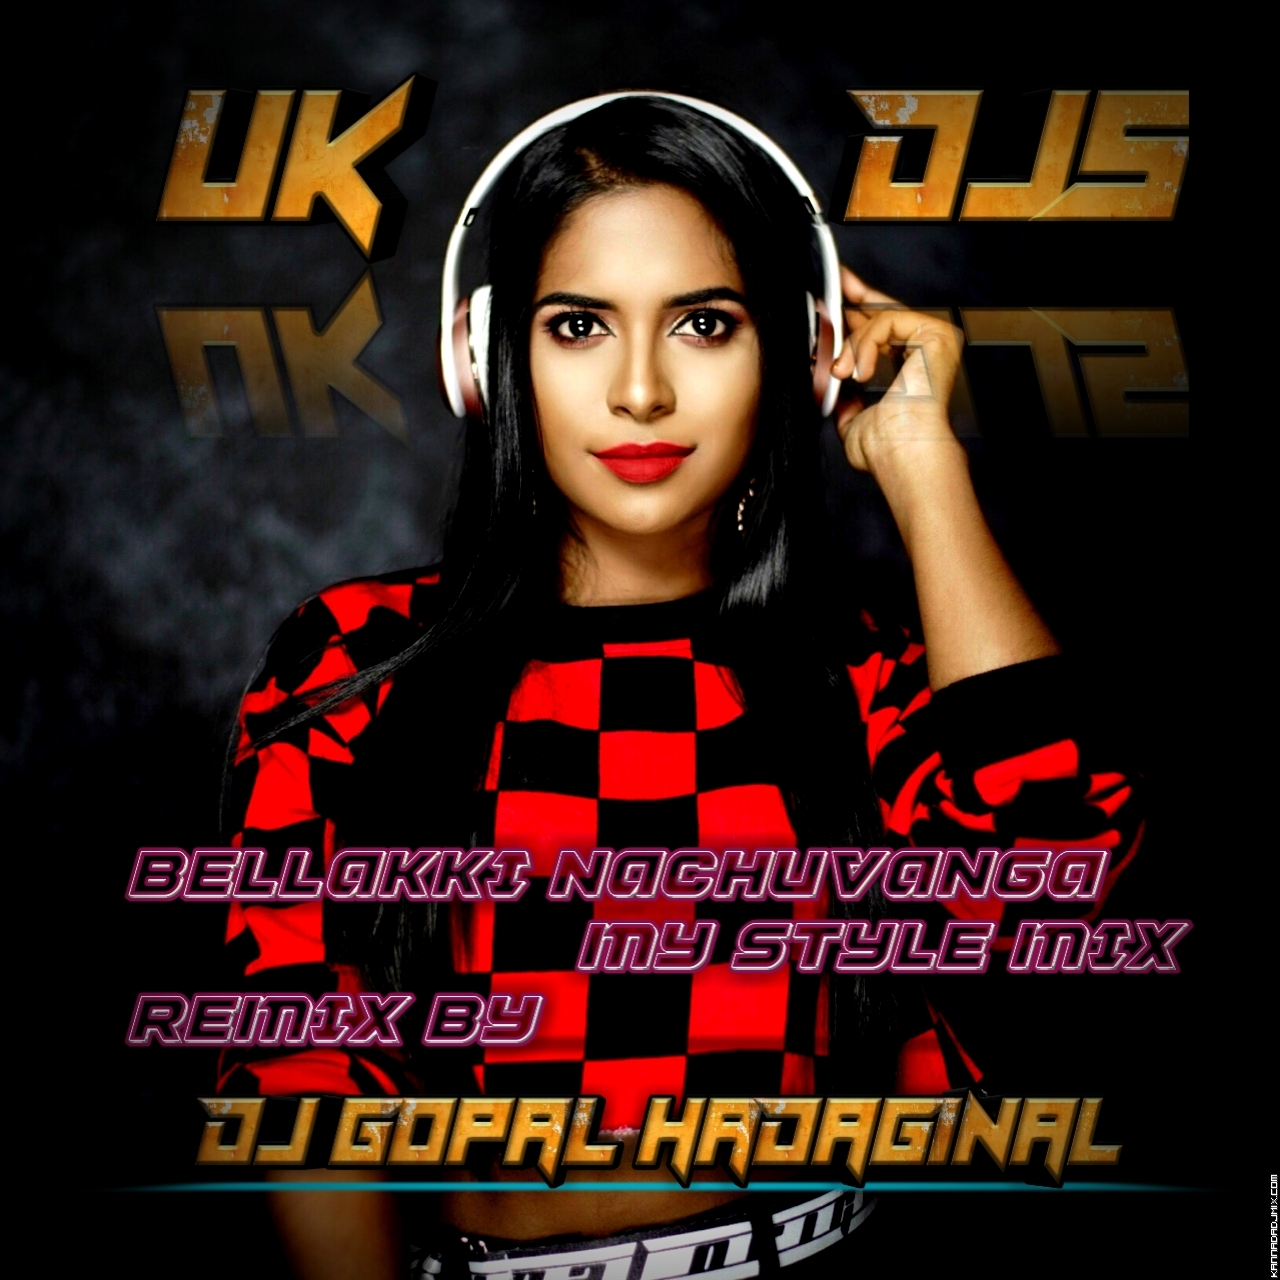 BELLAKKI NACHUVANGA DANCE MIX DJ GOPAL HADAGINAL.mp3